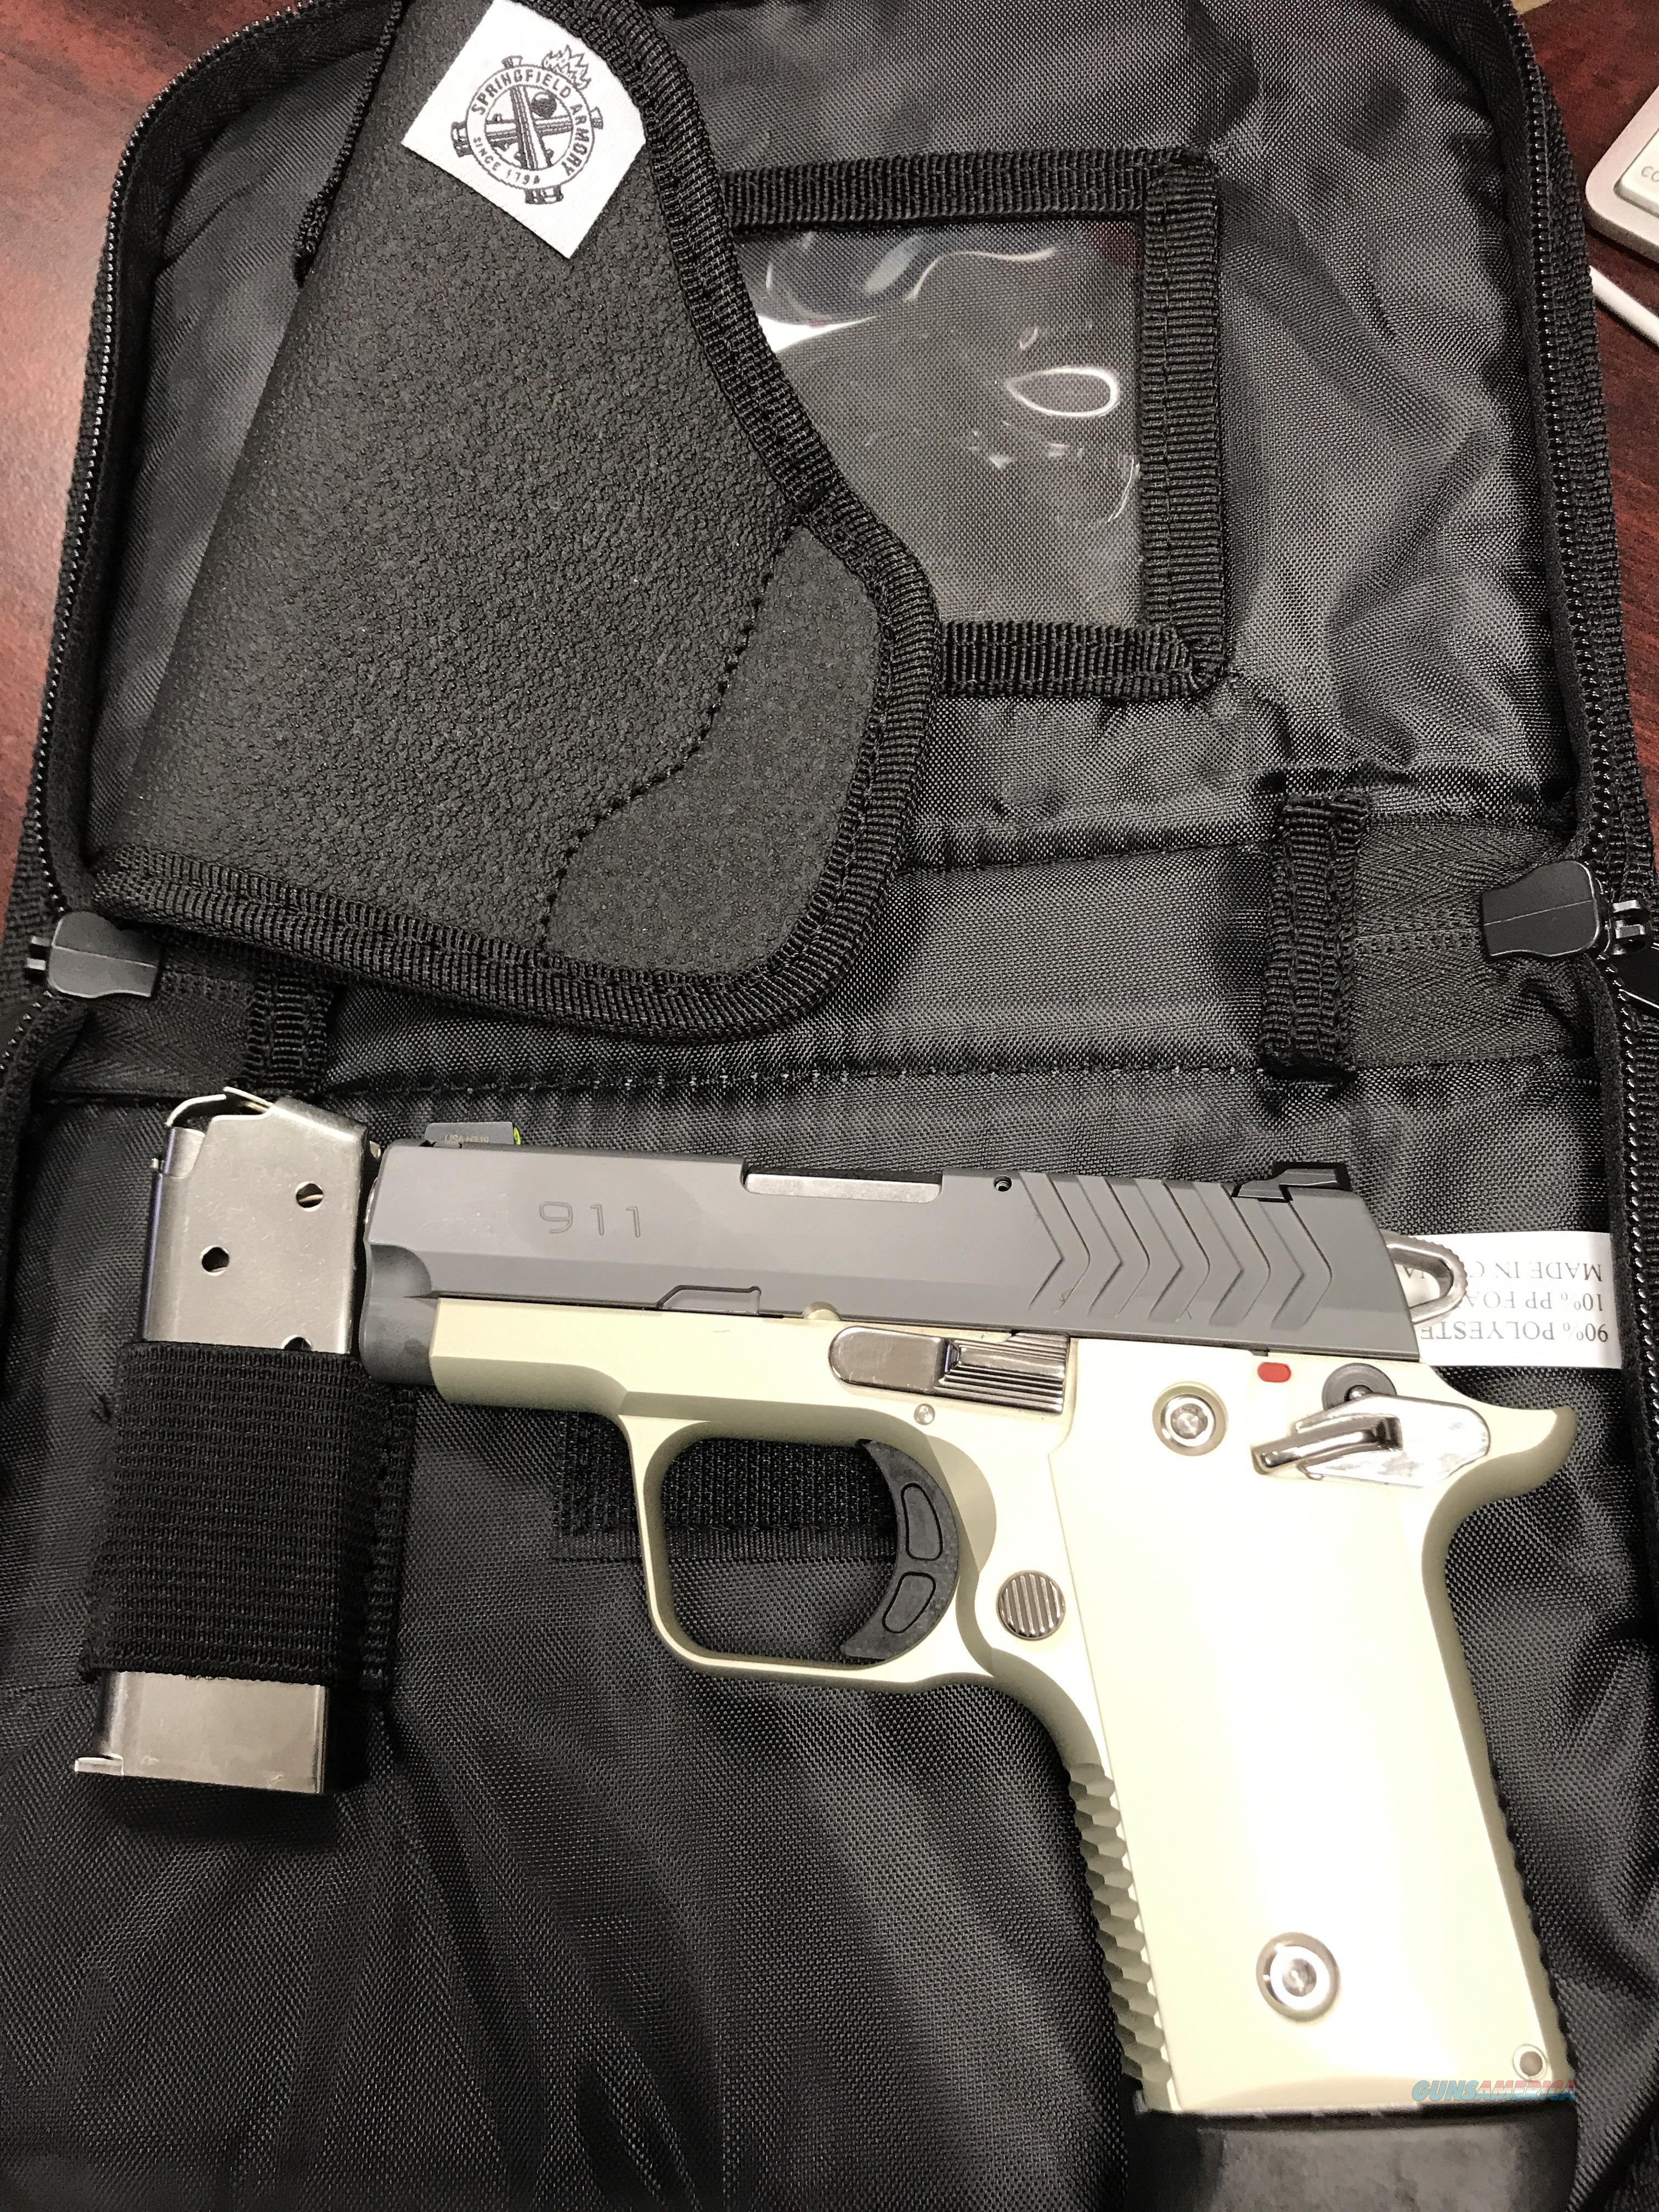 SPRINGFIELD 911 PLATNUM 380    FREE SHIPPING  Guns > Pistols > Springfield Armory Pistols > 911